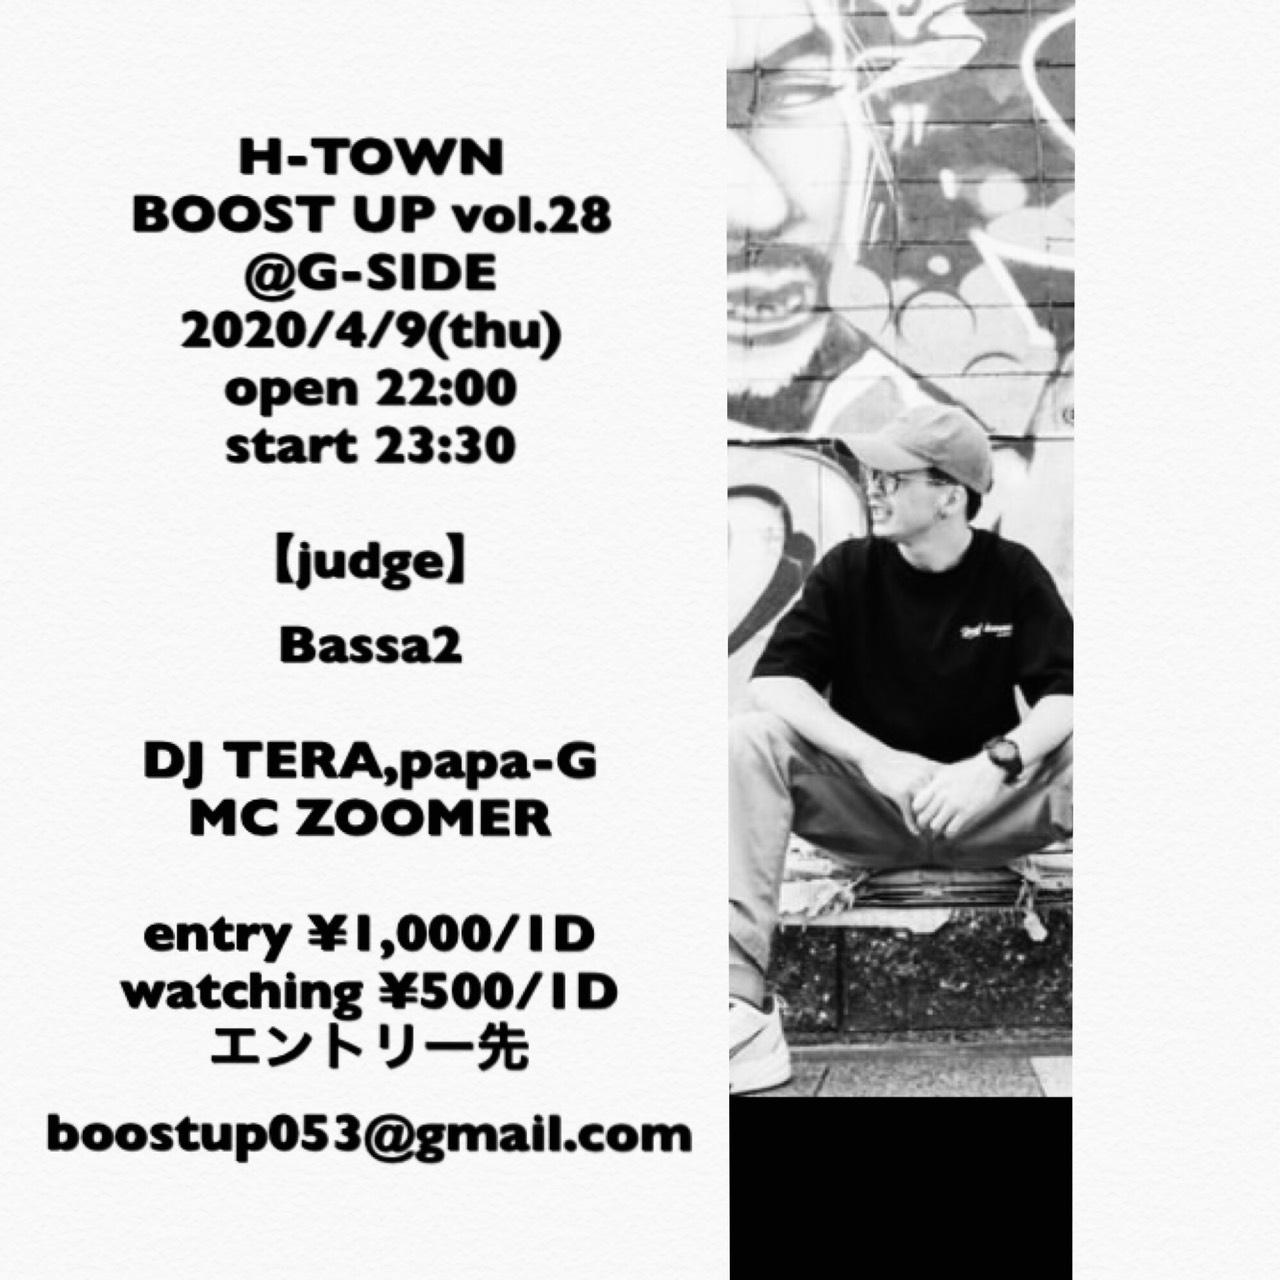 4月9日木曜日 H-TOWN BOOST UP vol.28